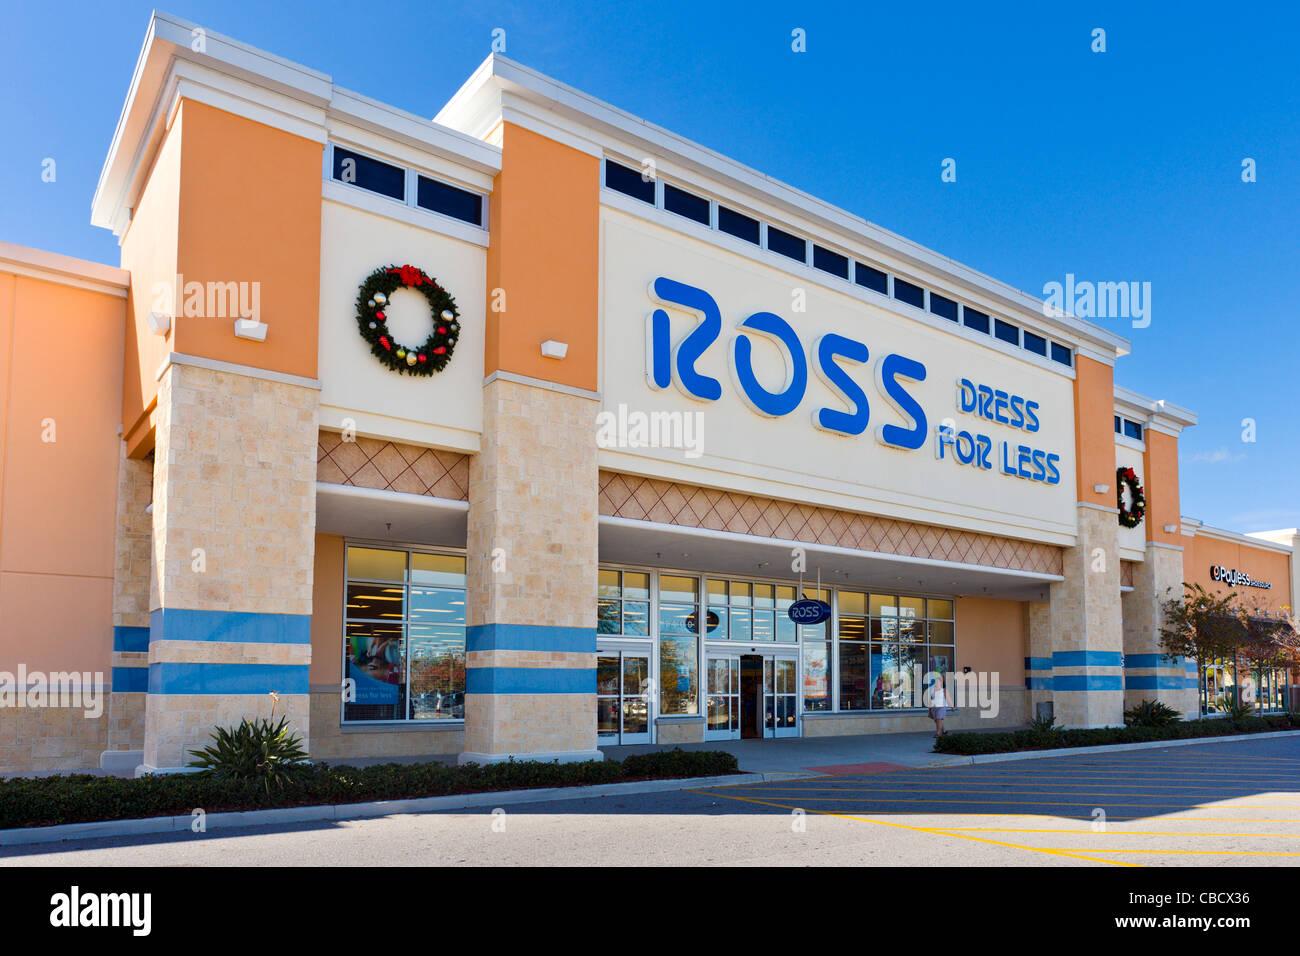 352a9faf63a1 Ross Dress for Less store at Posner Park retail development, Davenport,  Central Florida, USA